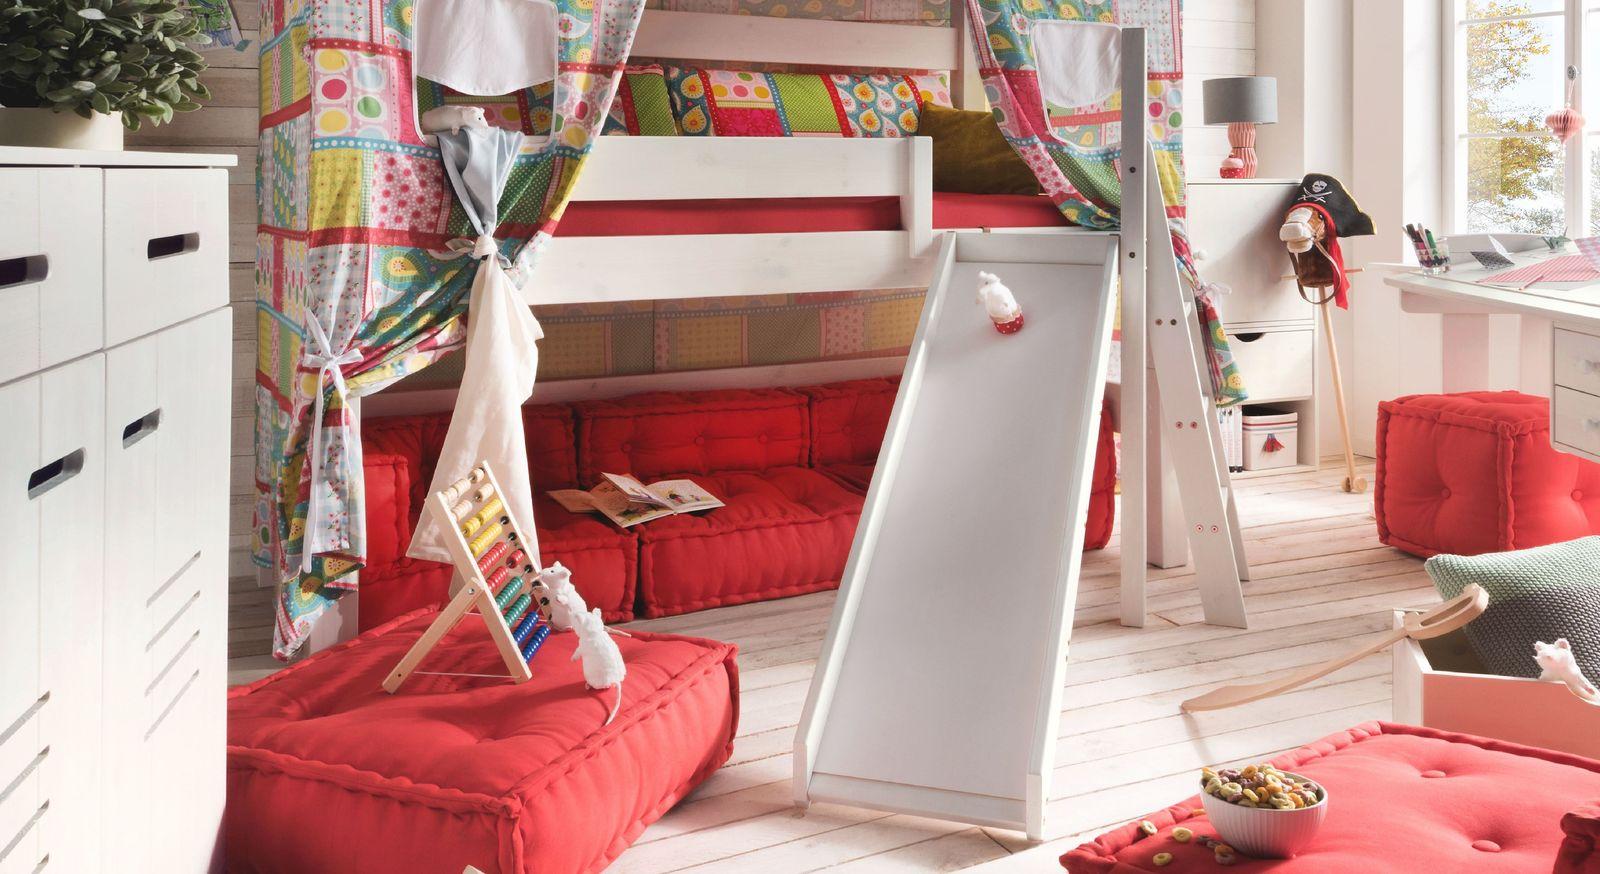 Sitzkissen-Sofa Kids Paradise als ideale Ergänzung zu Hochbetten